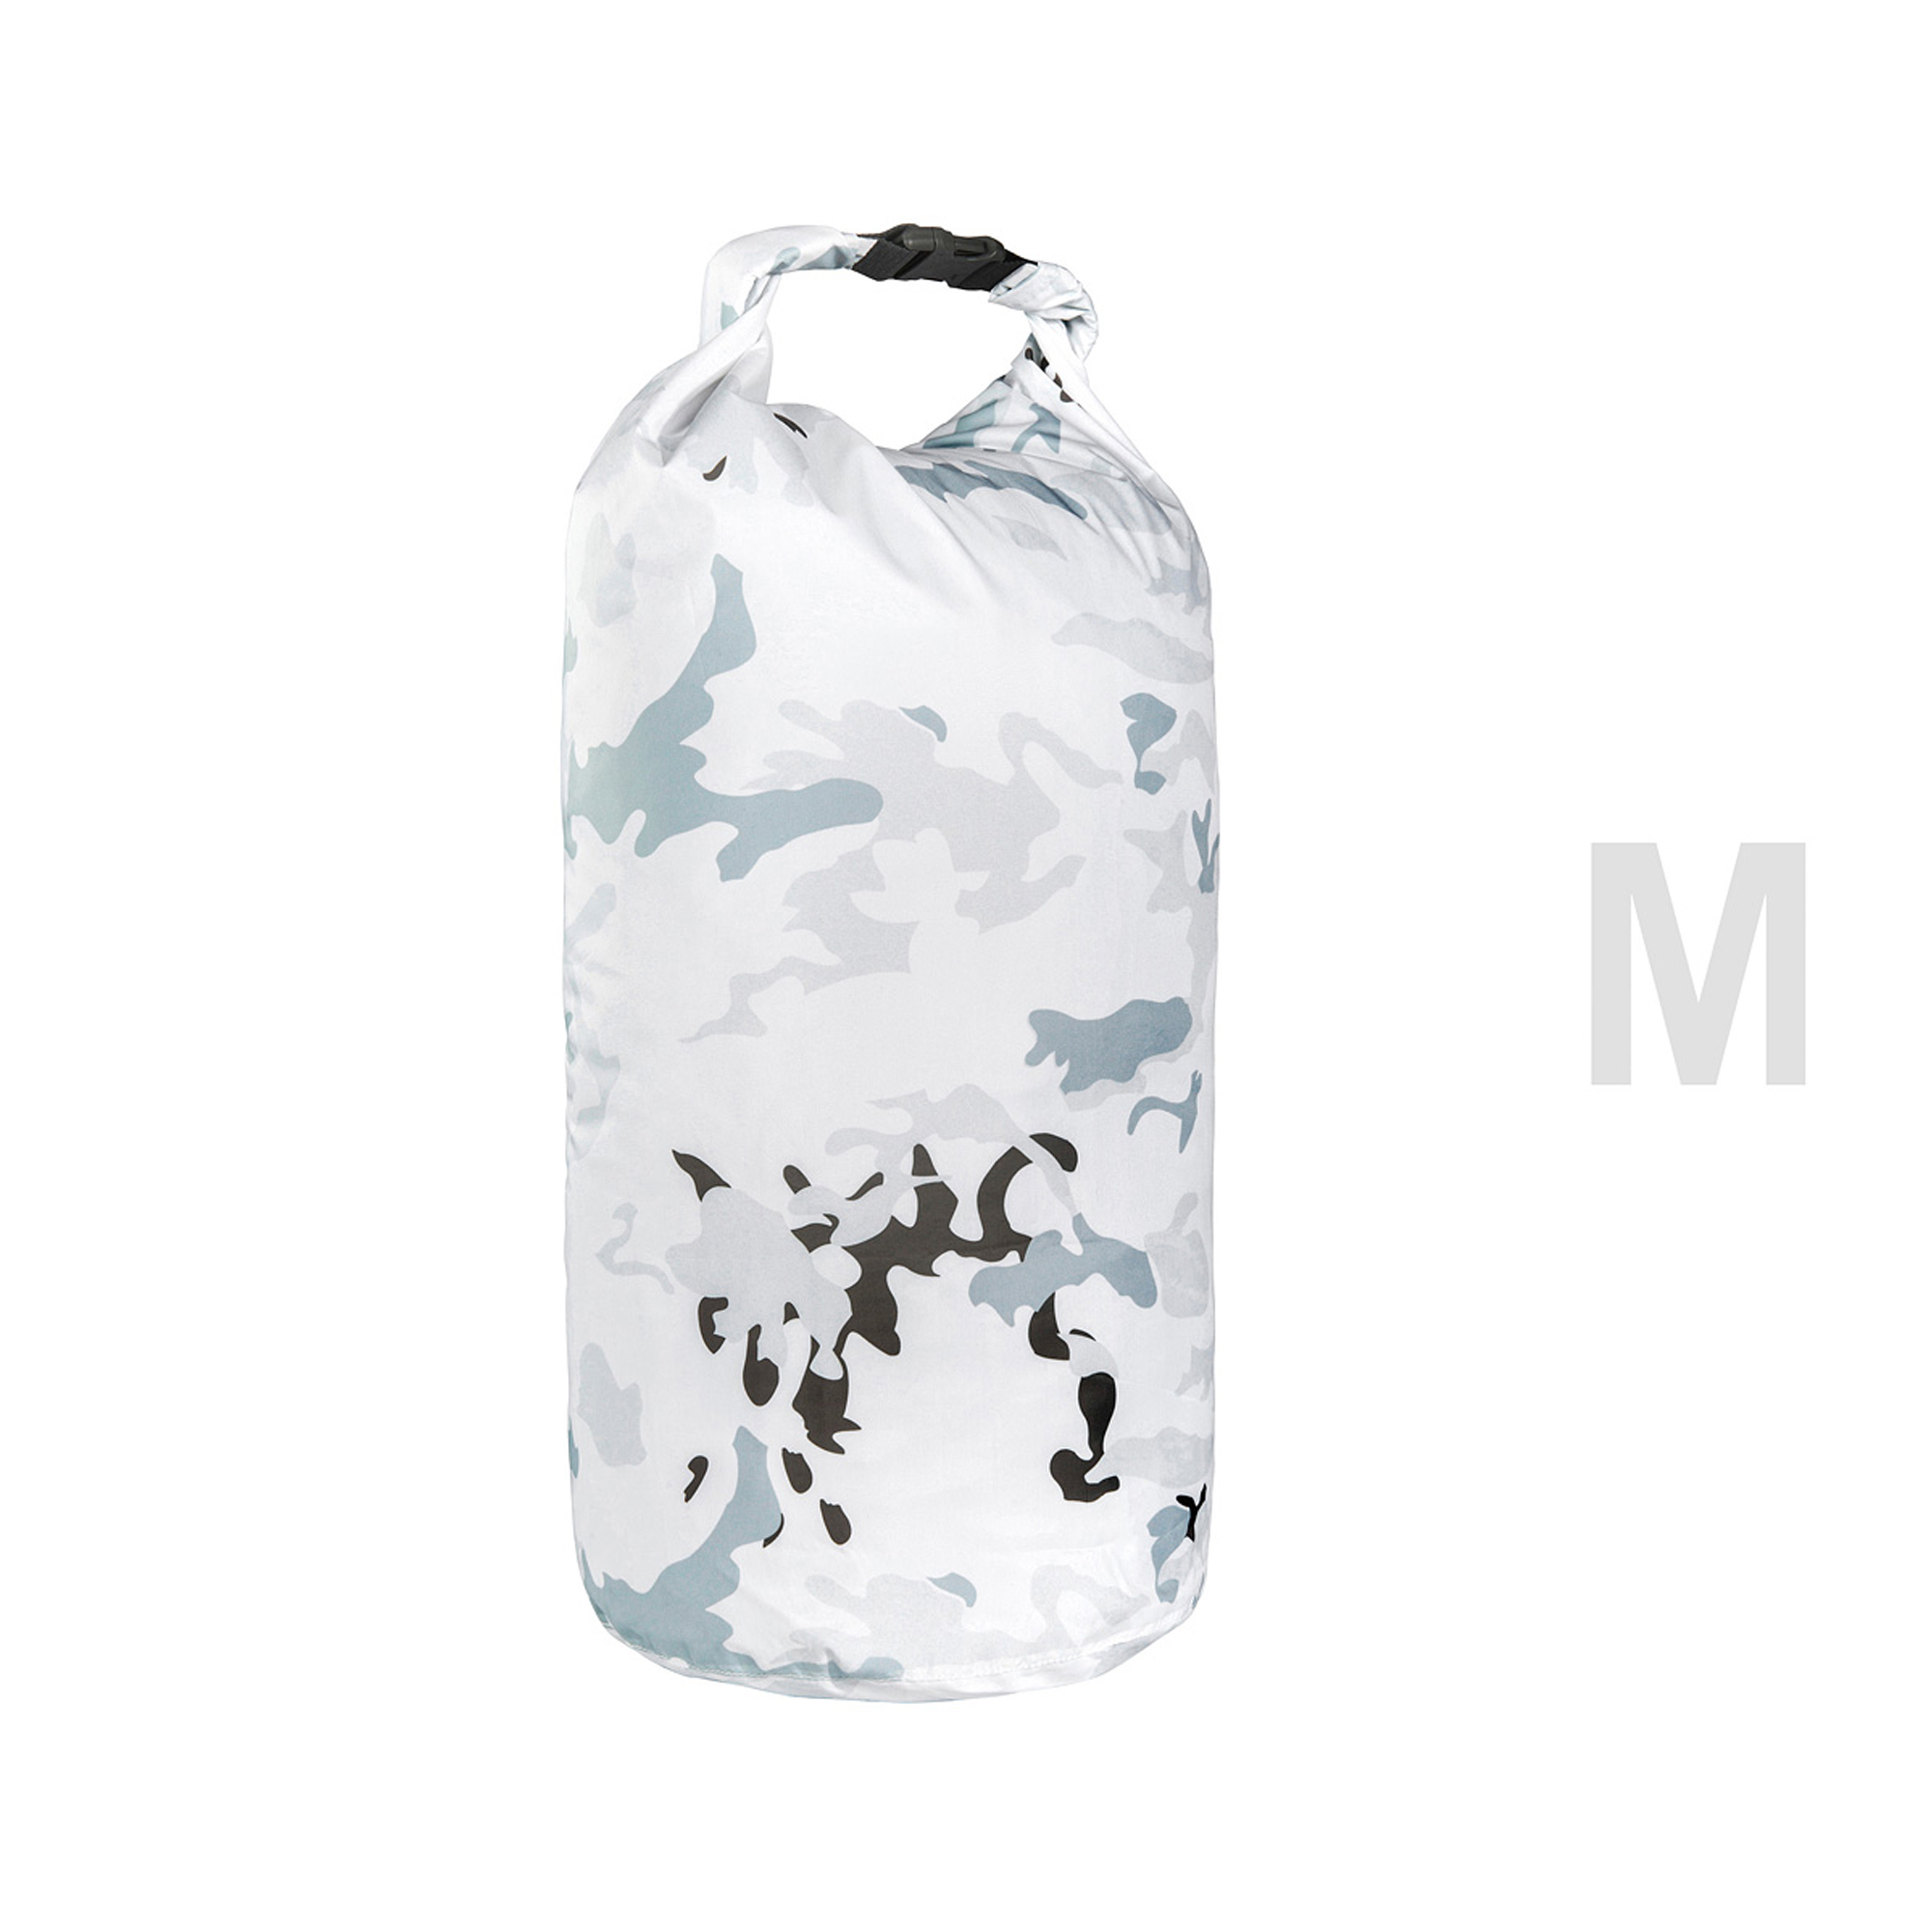 Tasmanian Tiger Waterproof Bag Snow 4-color snow forest